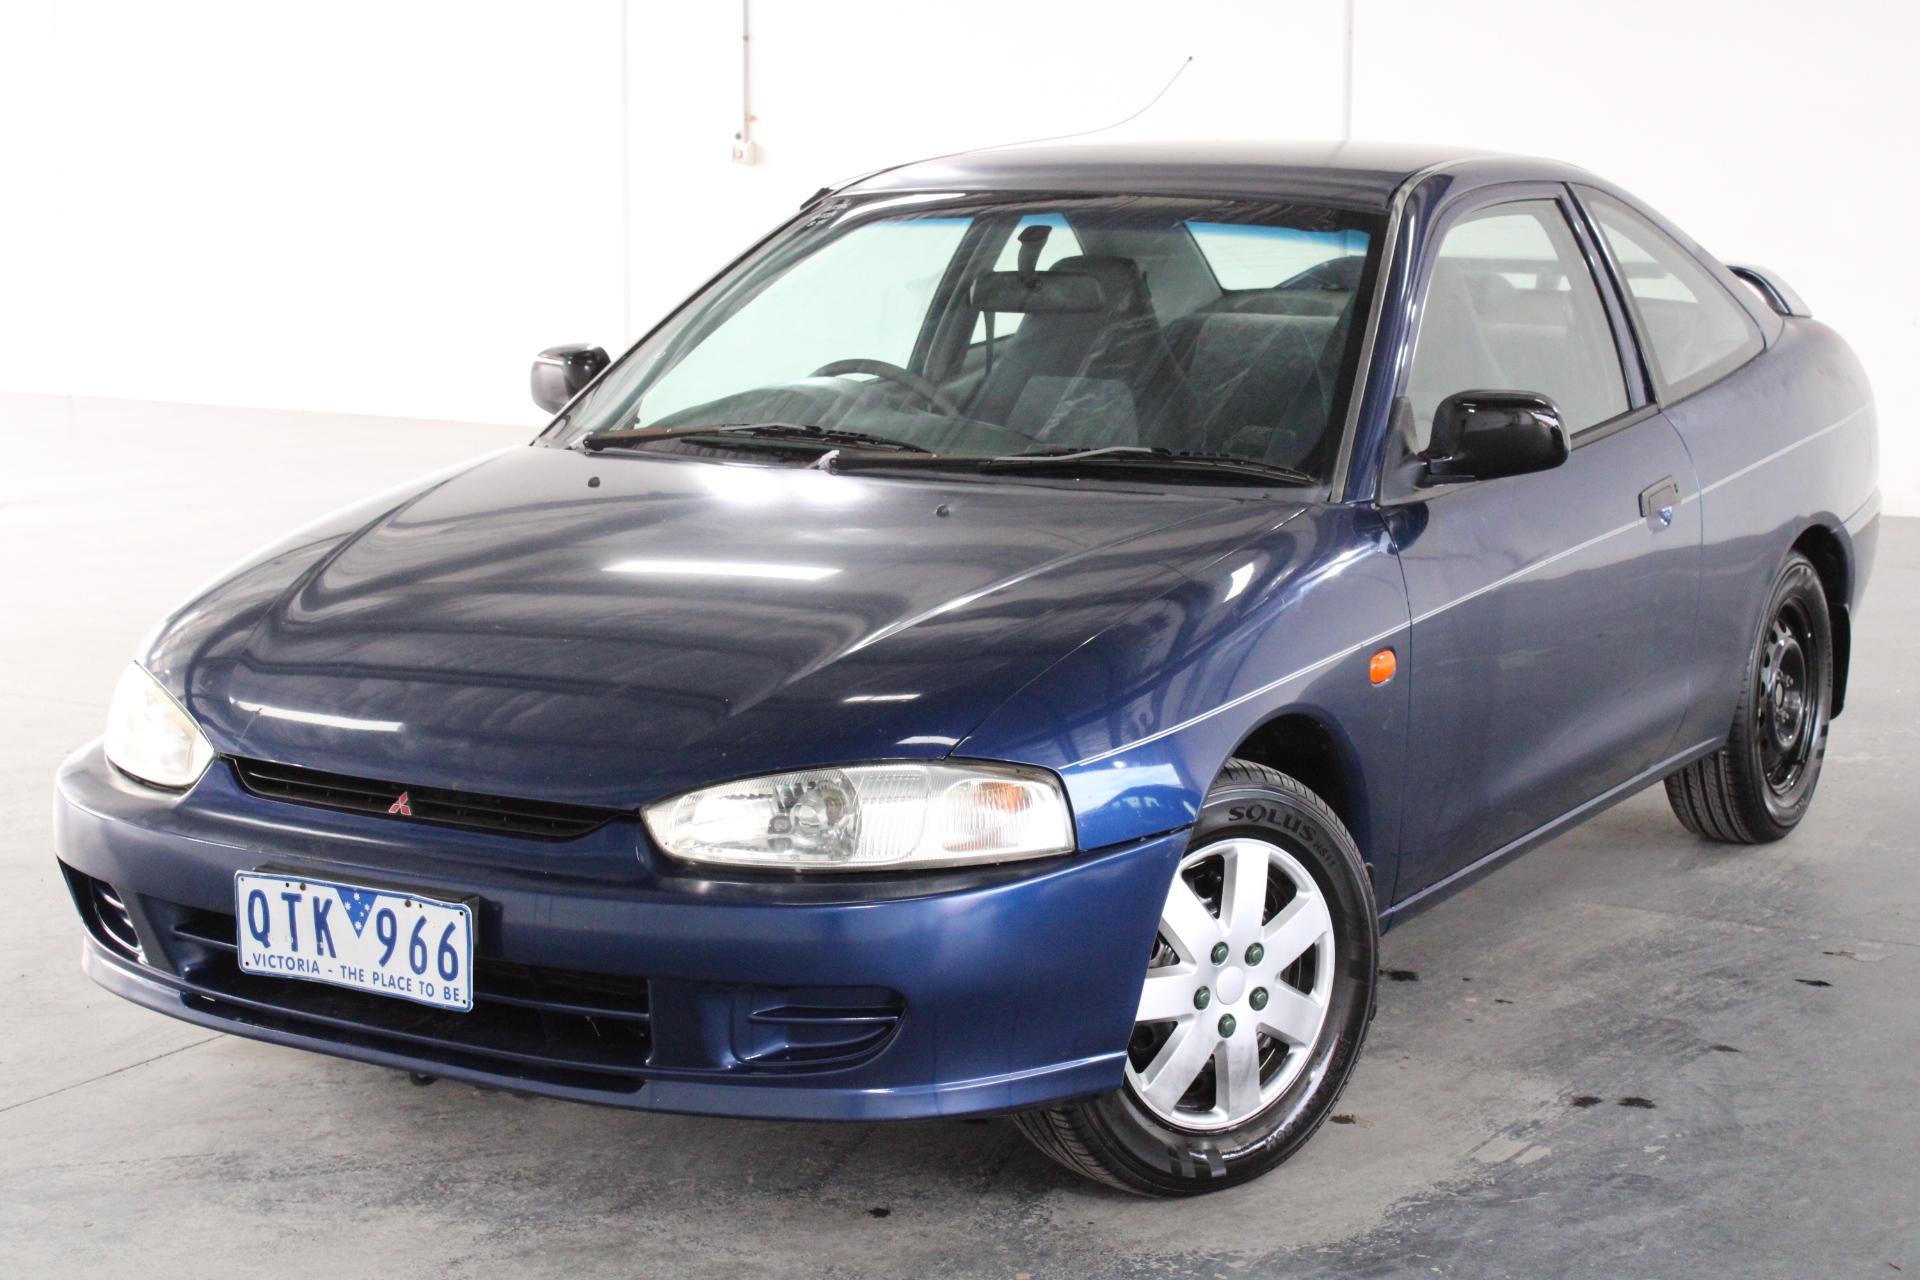 2001 Mitsubishi Lancer GLI CE Automatic Coupe